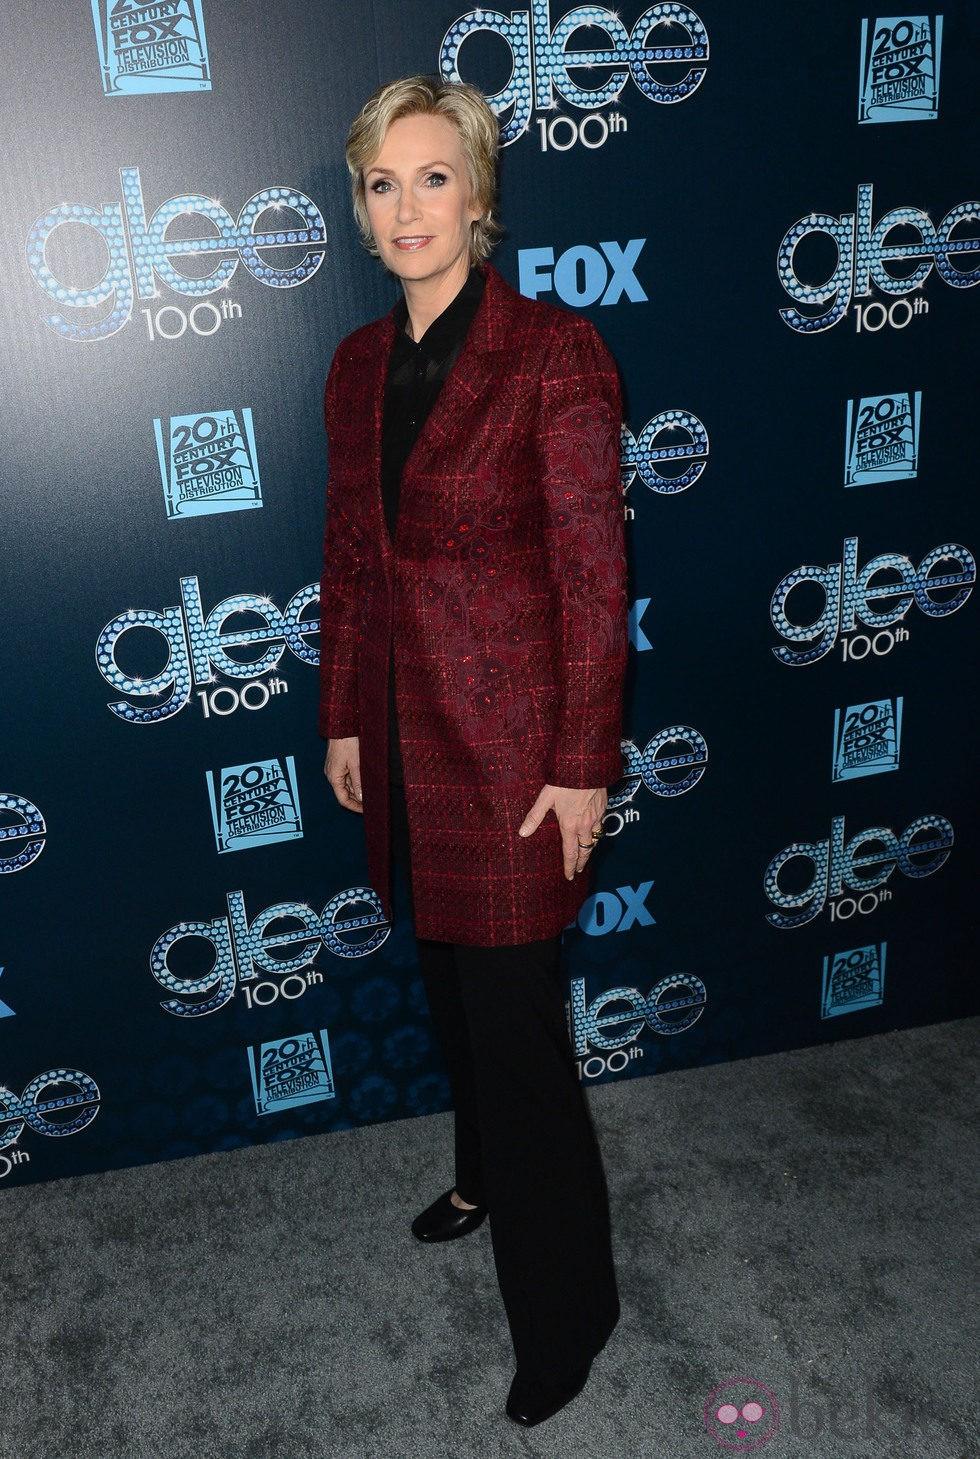 Jane Lynch en la fiesta del episodio 100 de 'Glee'